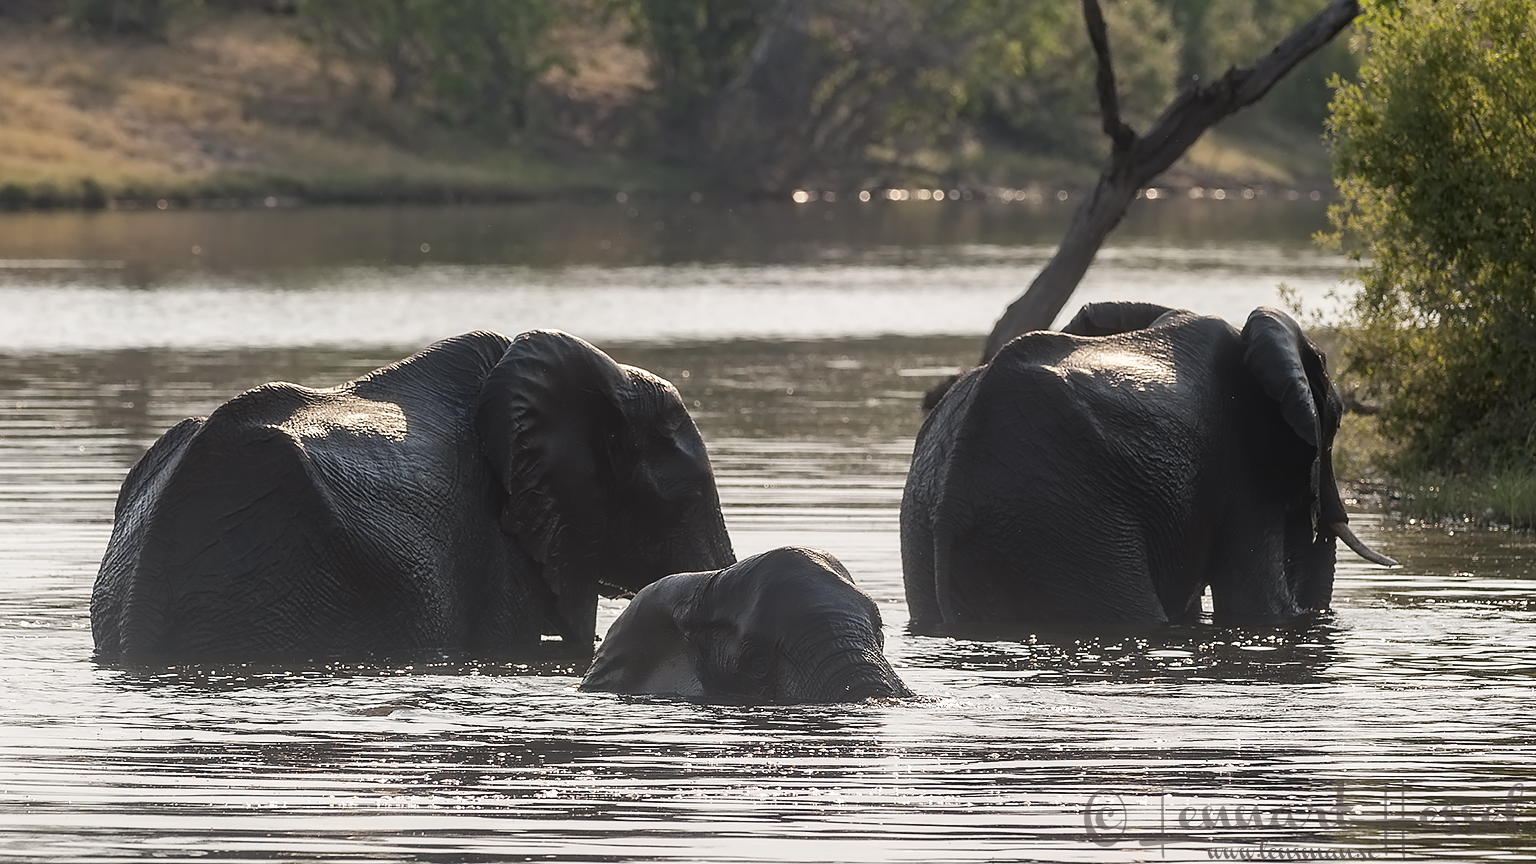 Elephants taking a bath in Savuti, Botswana